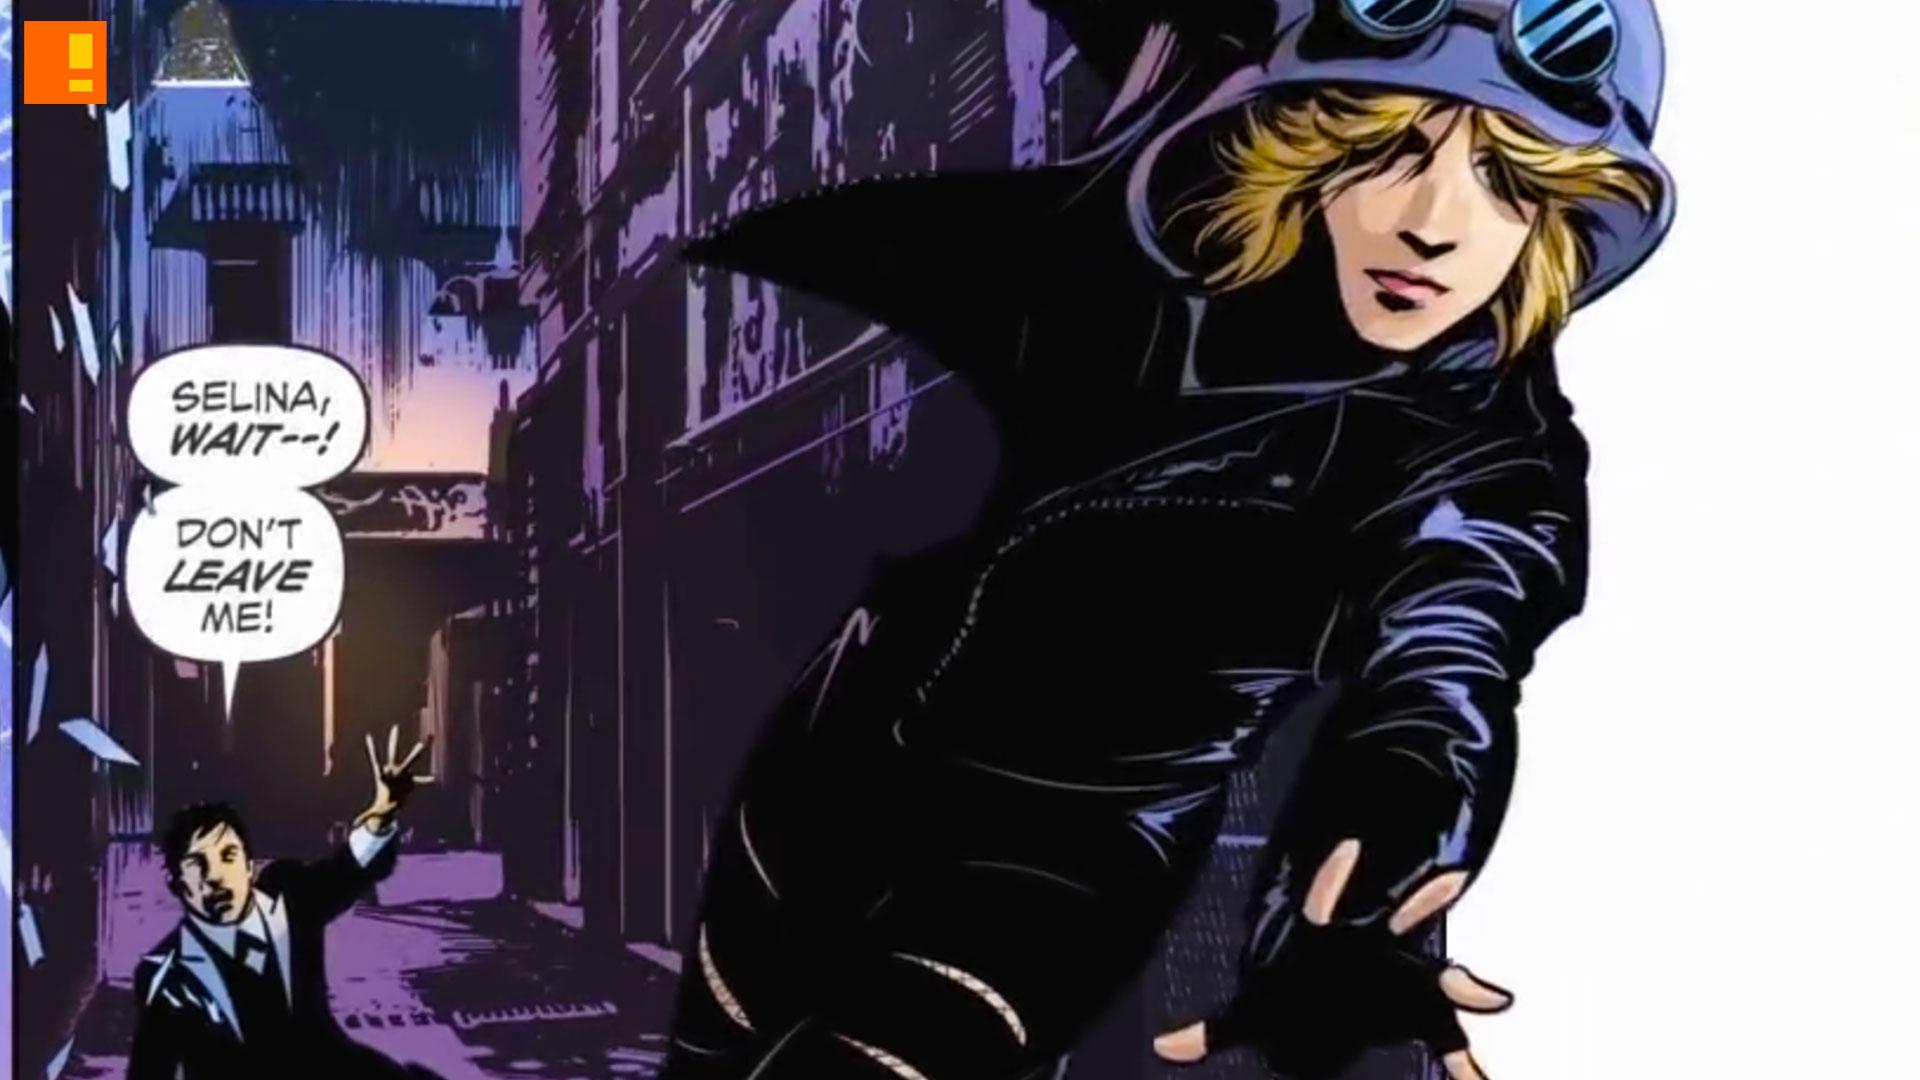 gotham stories. chapter 2. dc comics. gotham. the action pixel. fox. @theactionpixel